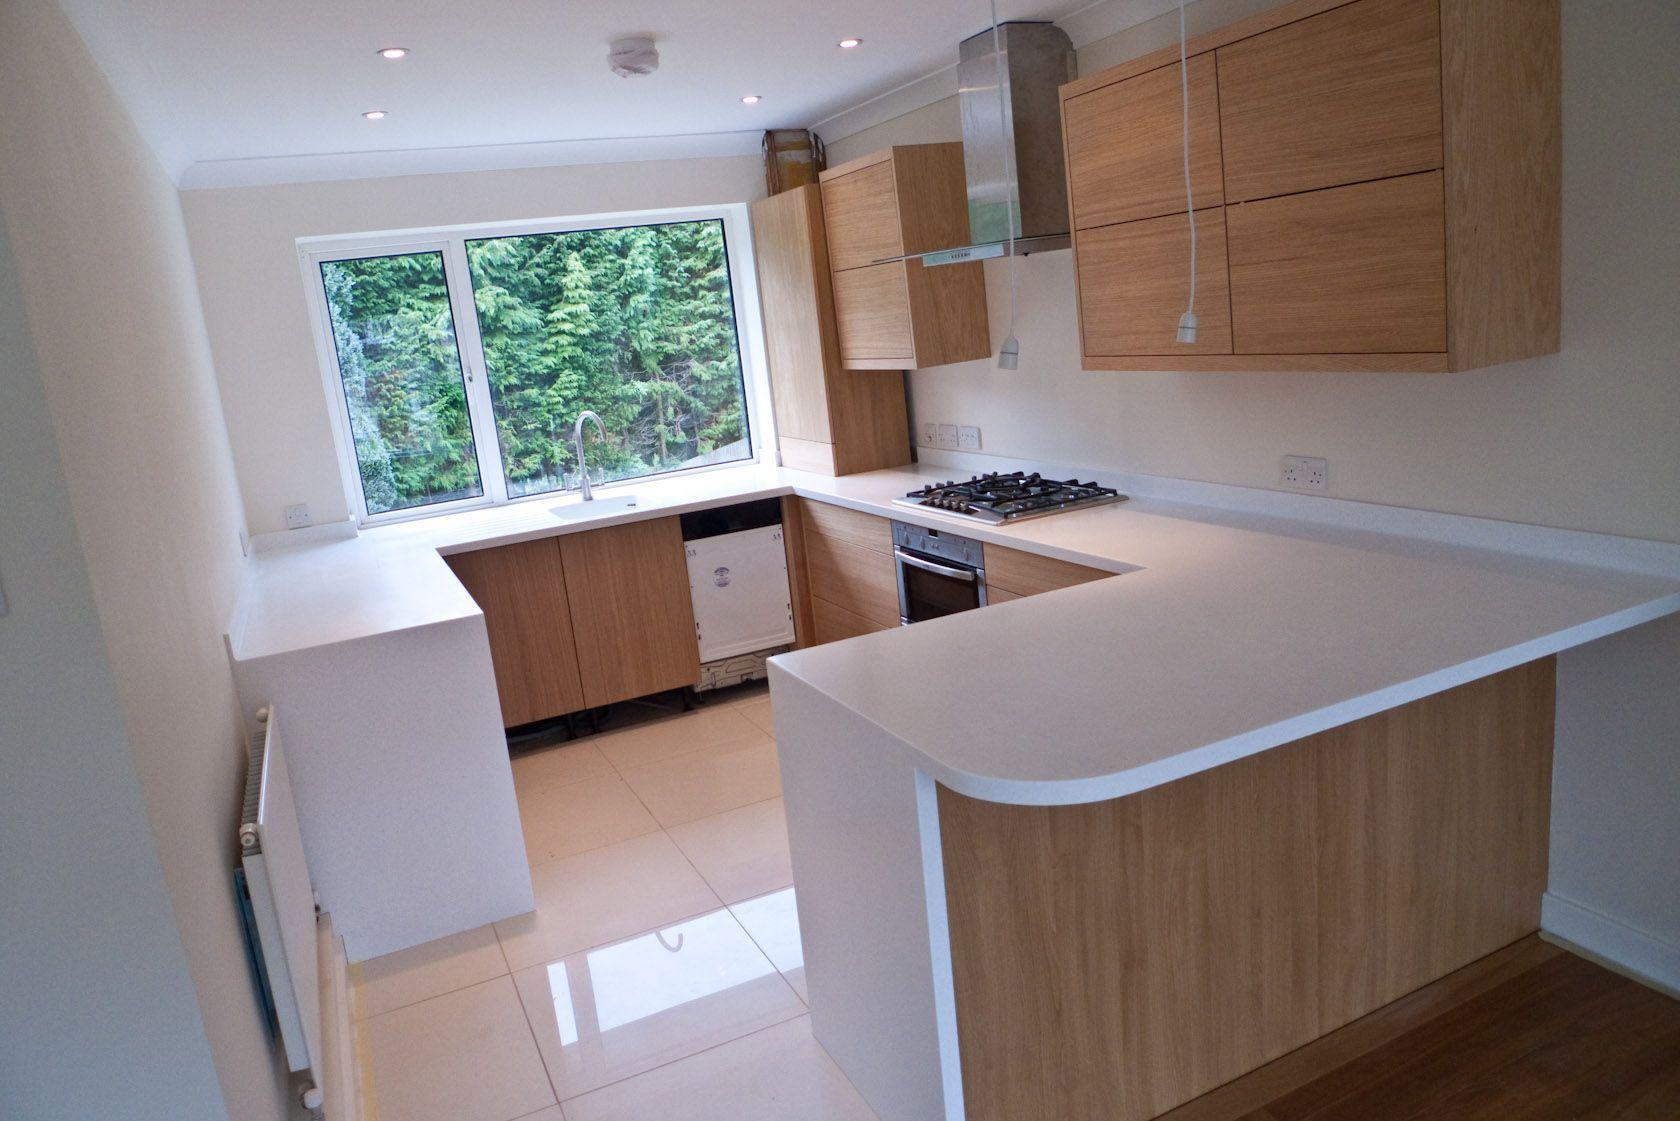 u shaped kitchen design layout with island ideas kitchen layout kitchen design small small u on u kitchen ideas small id=96050